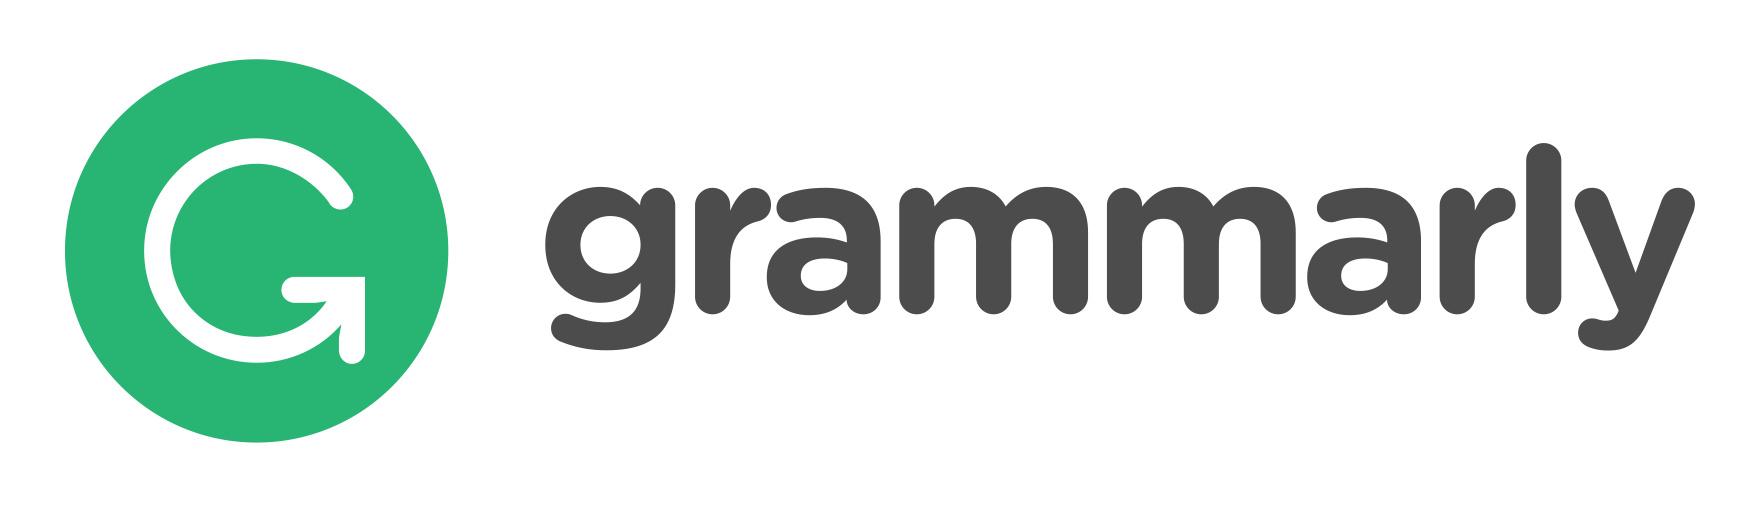 grammarly-logo-final_os1JPBf.png